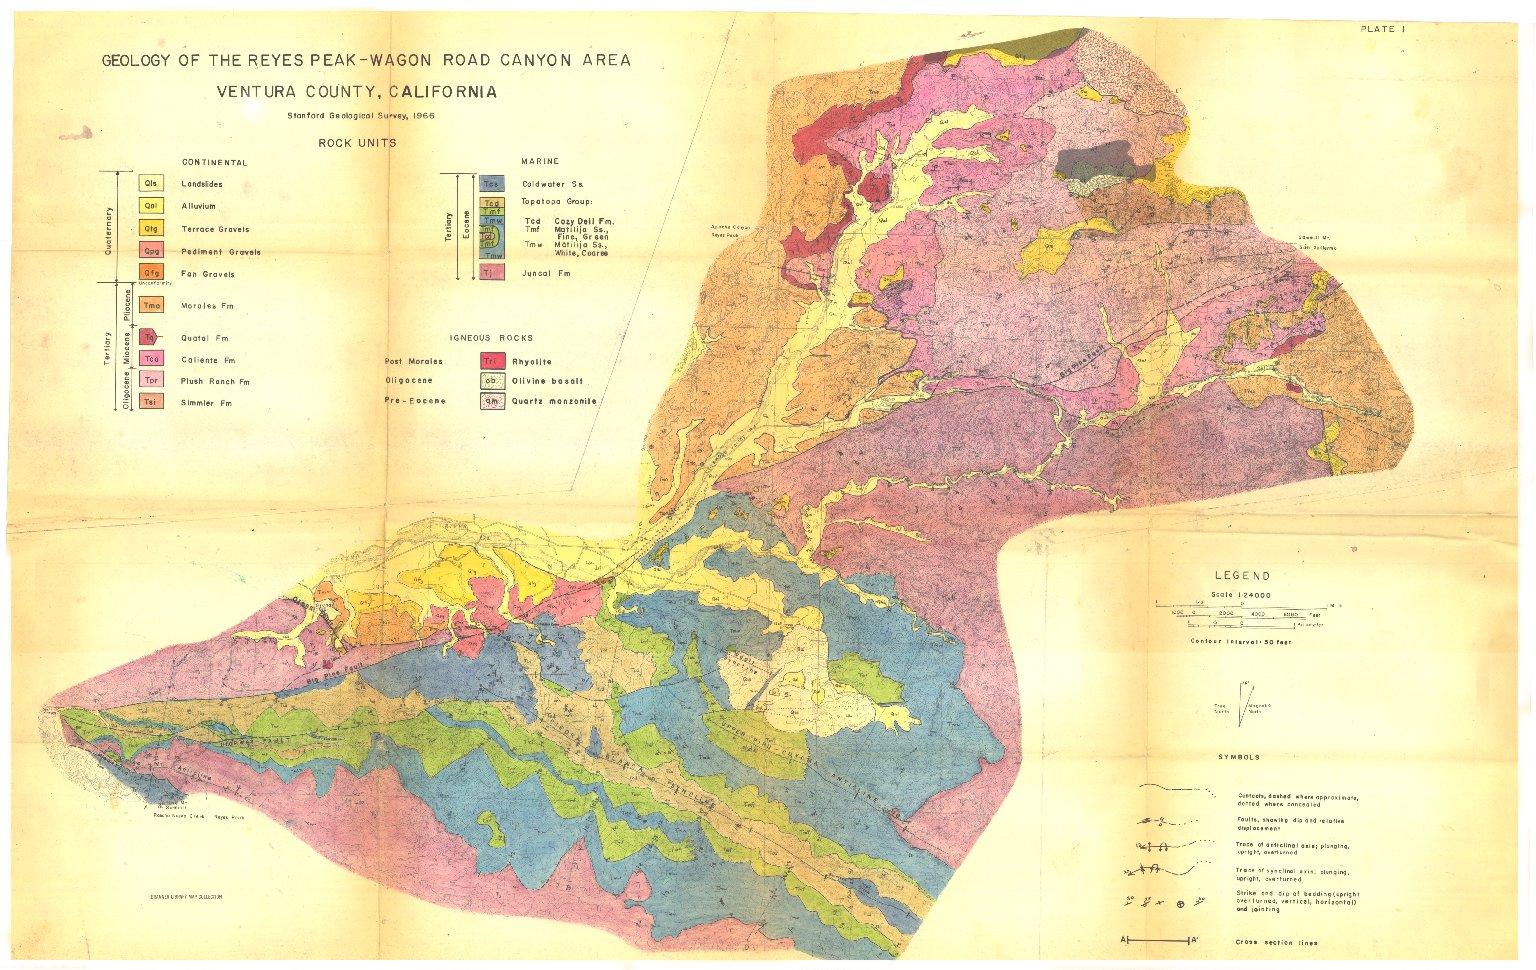 Geology of the Reyes Creek-Wagon Road Canyon area, Ventura County, California